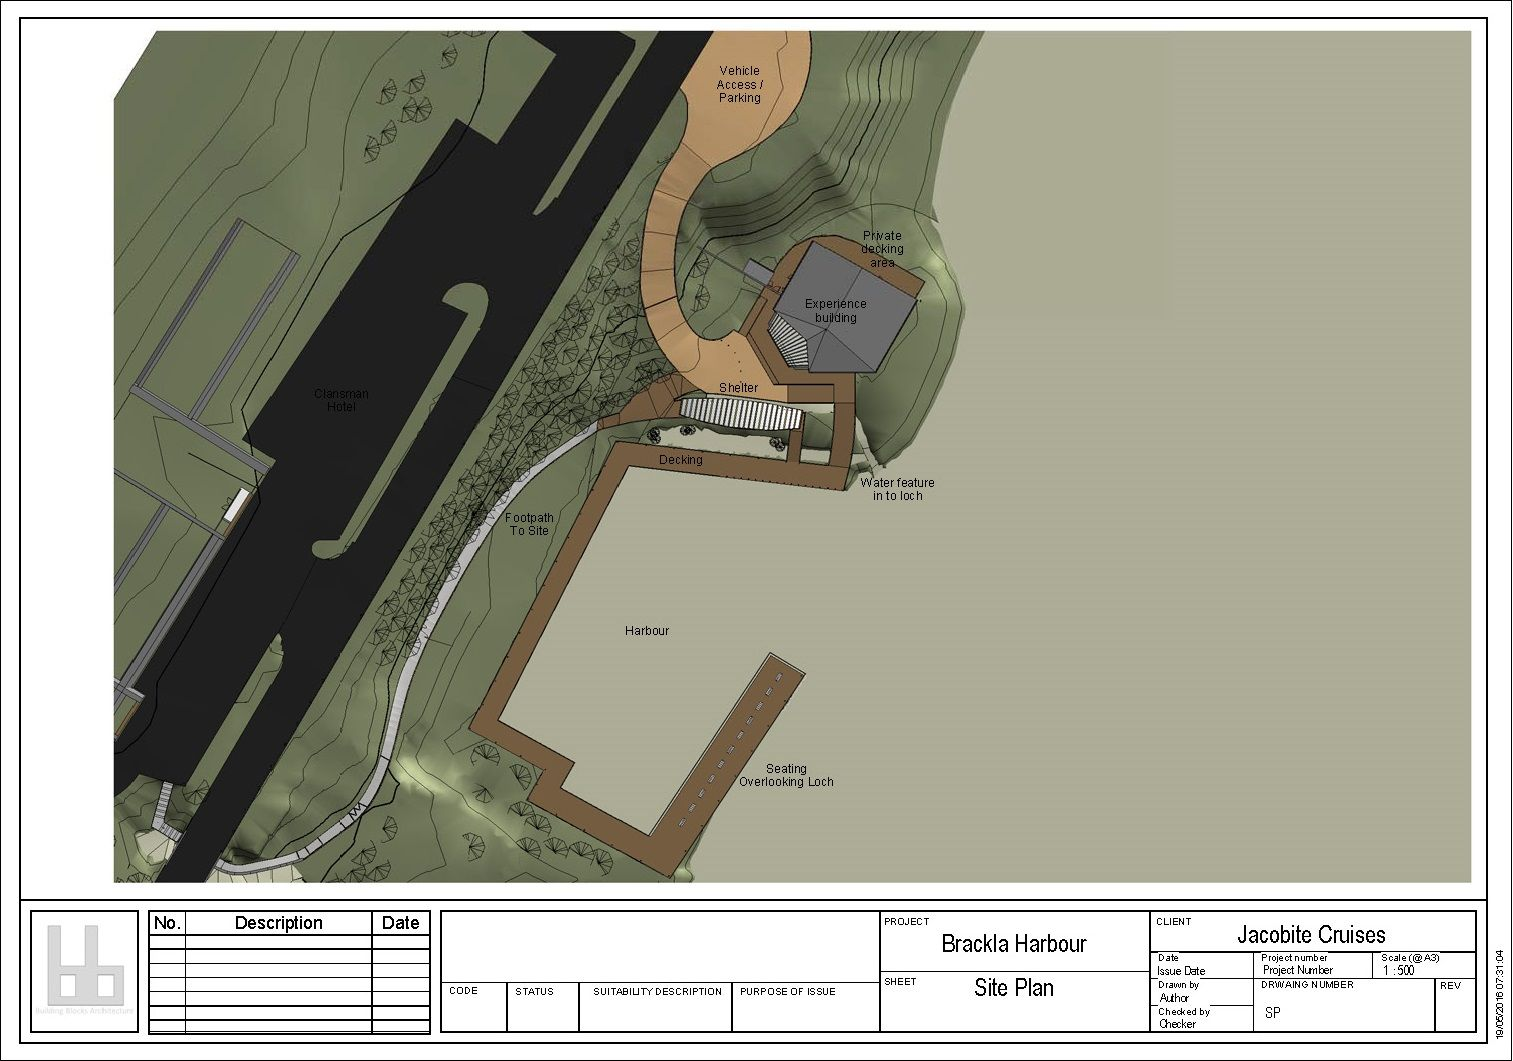 Sheet---sp---site-plan-3500-3500